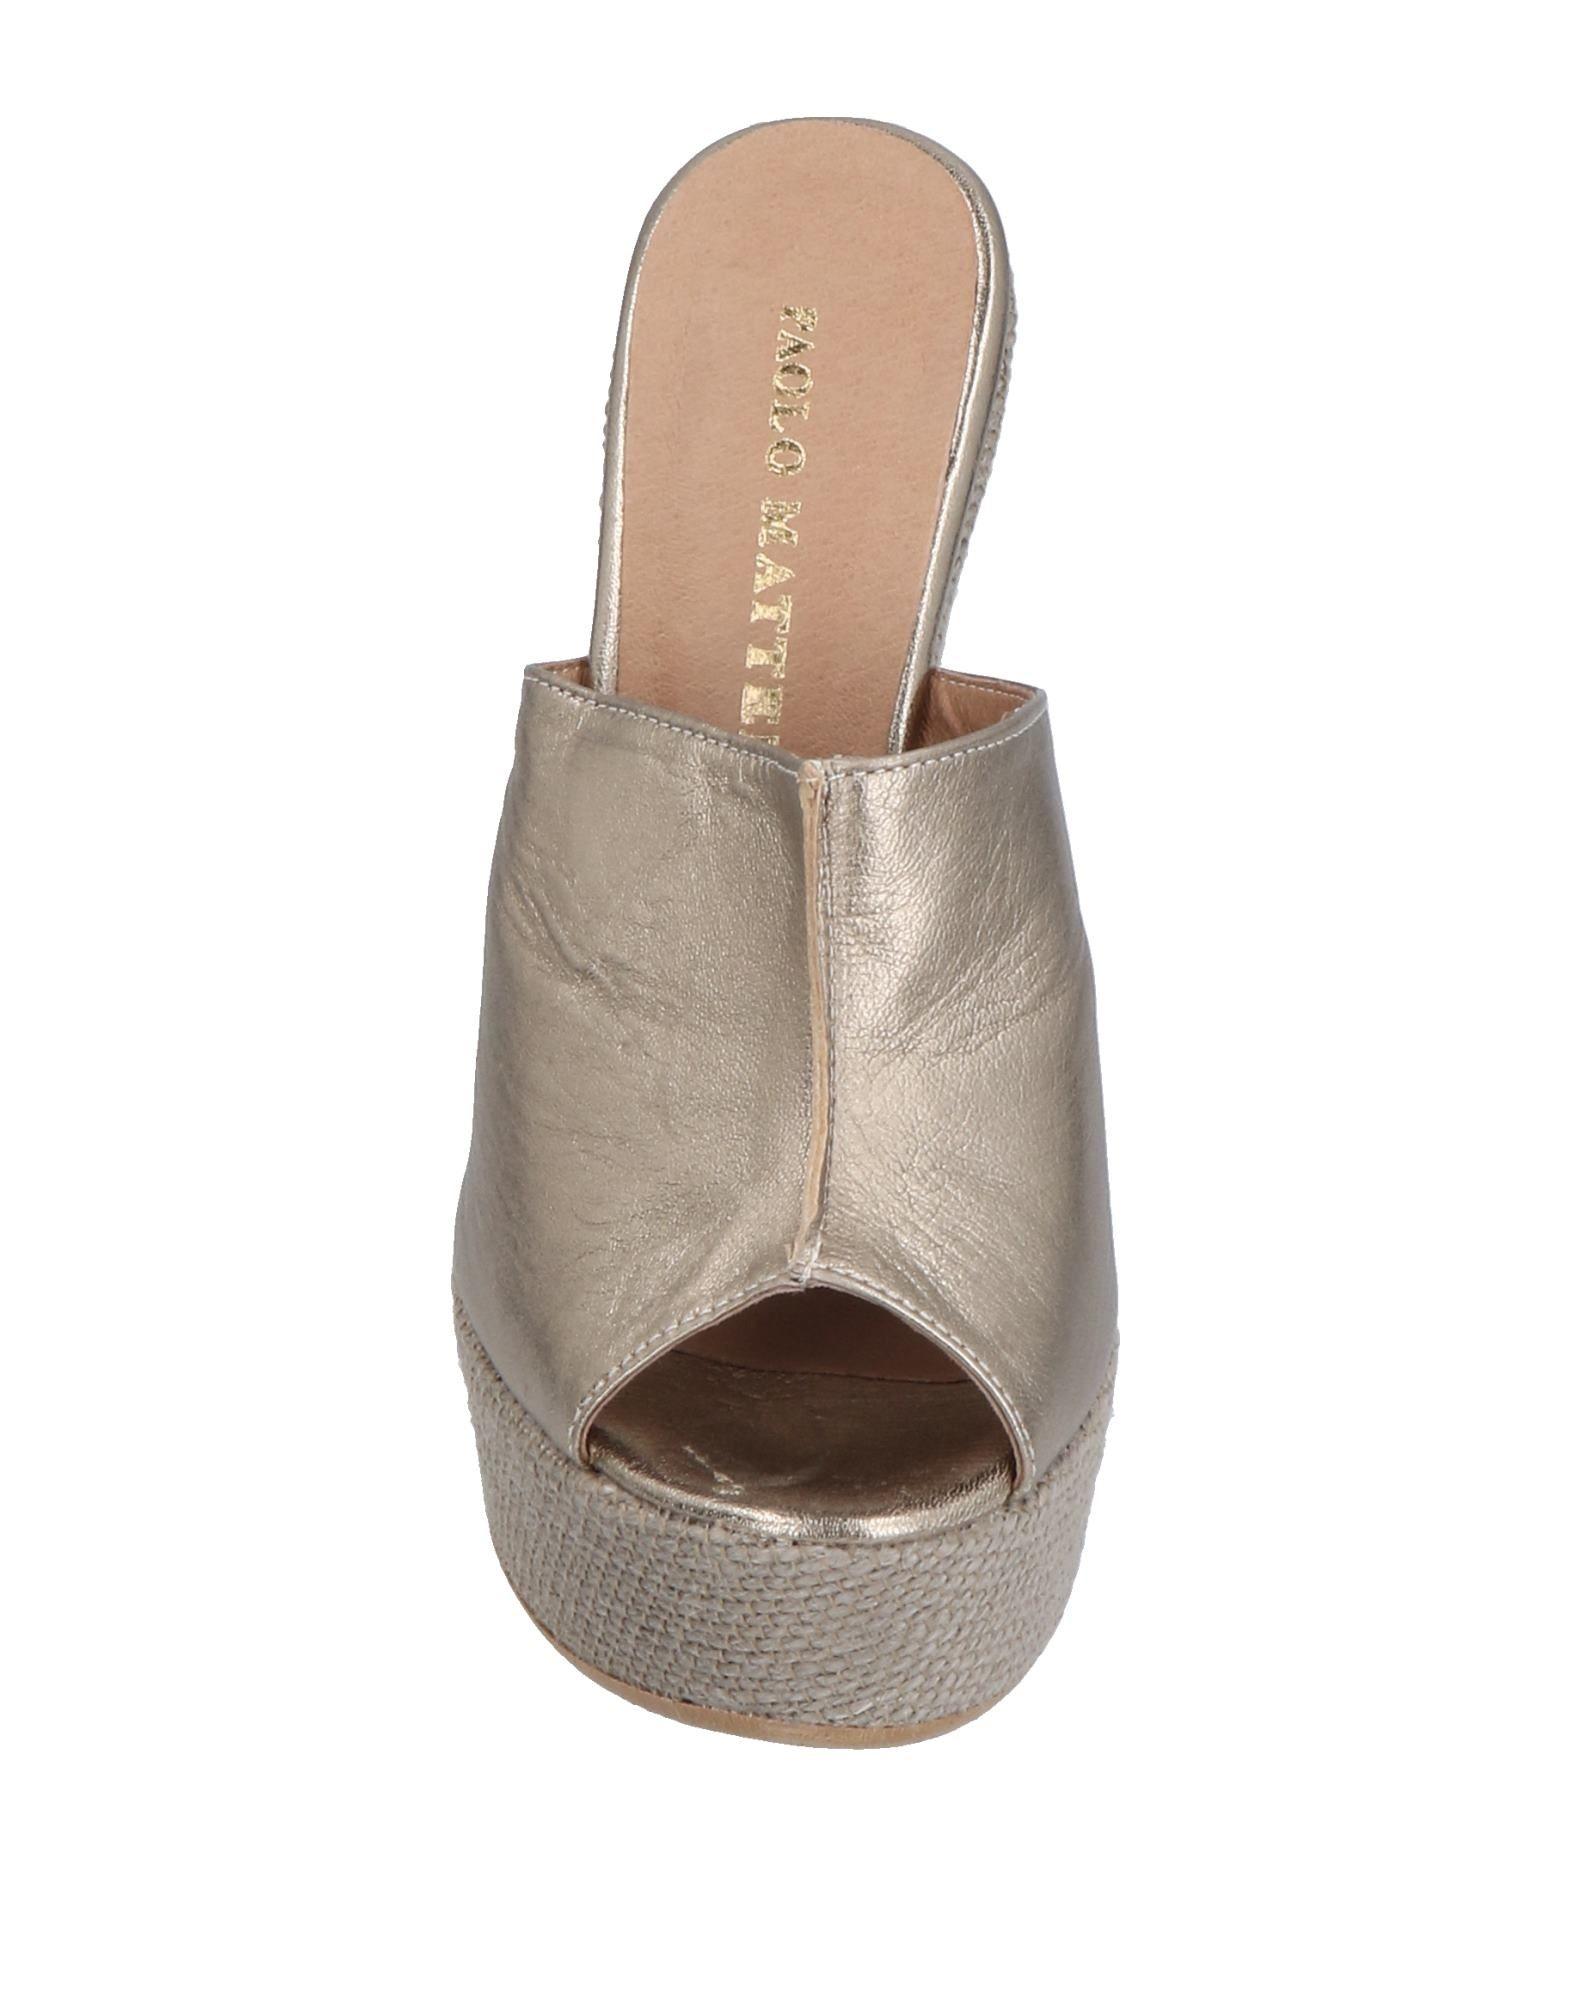 Stilvolle billige Schuhe Paolo 11493956HX Mattei Sandalen Damen  11493956HX Paolo 07721a